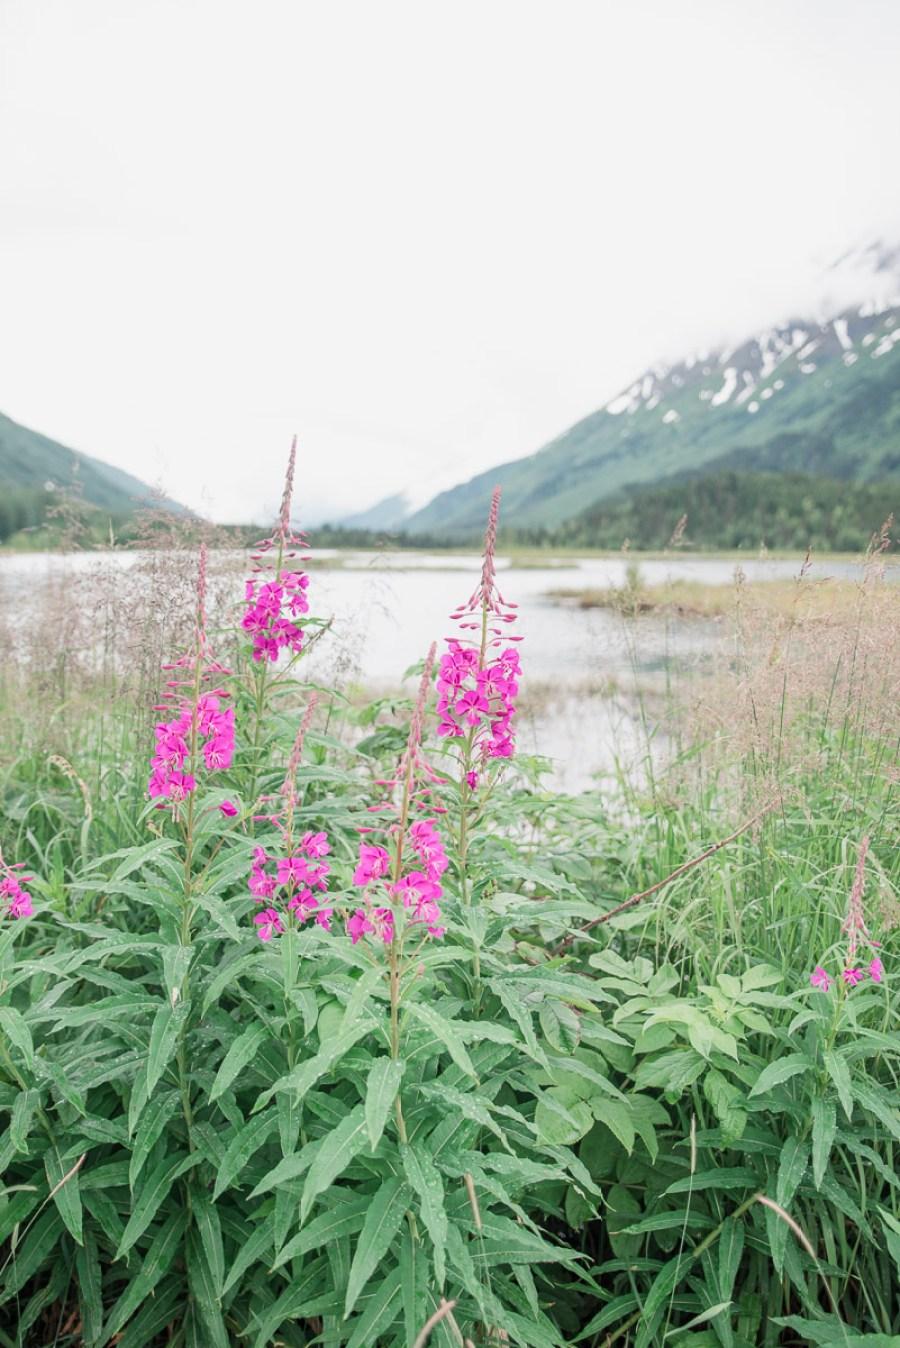 alaska-anchorage-area-elinlights-photography-20